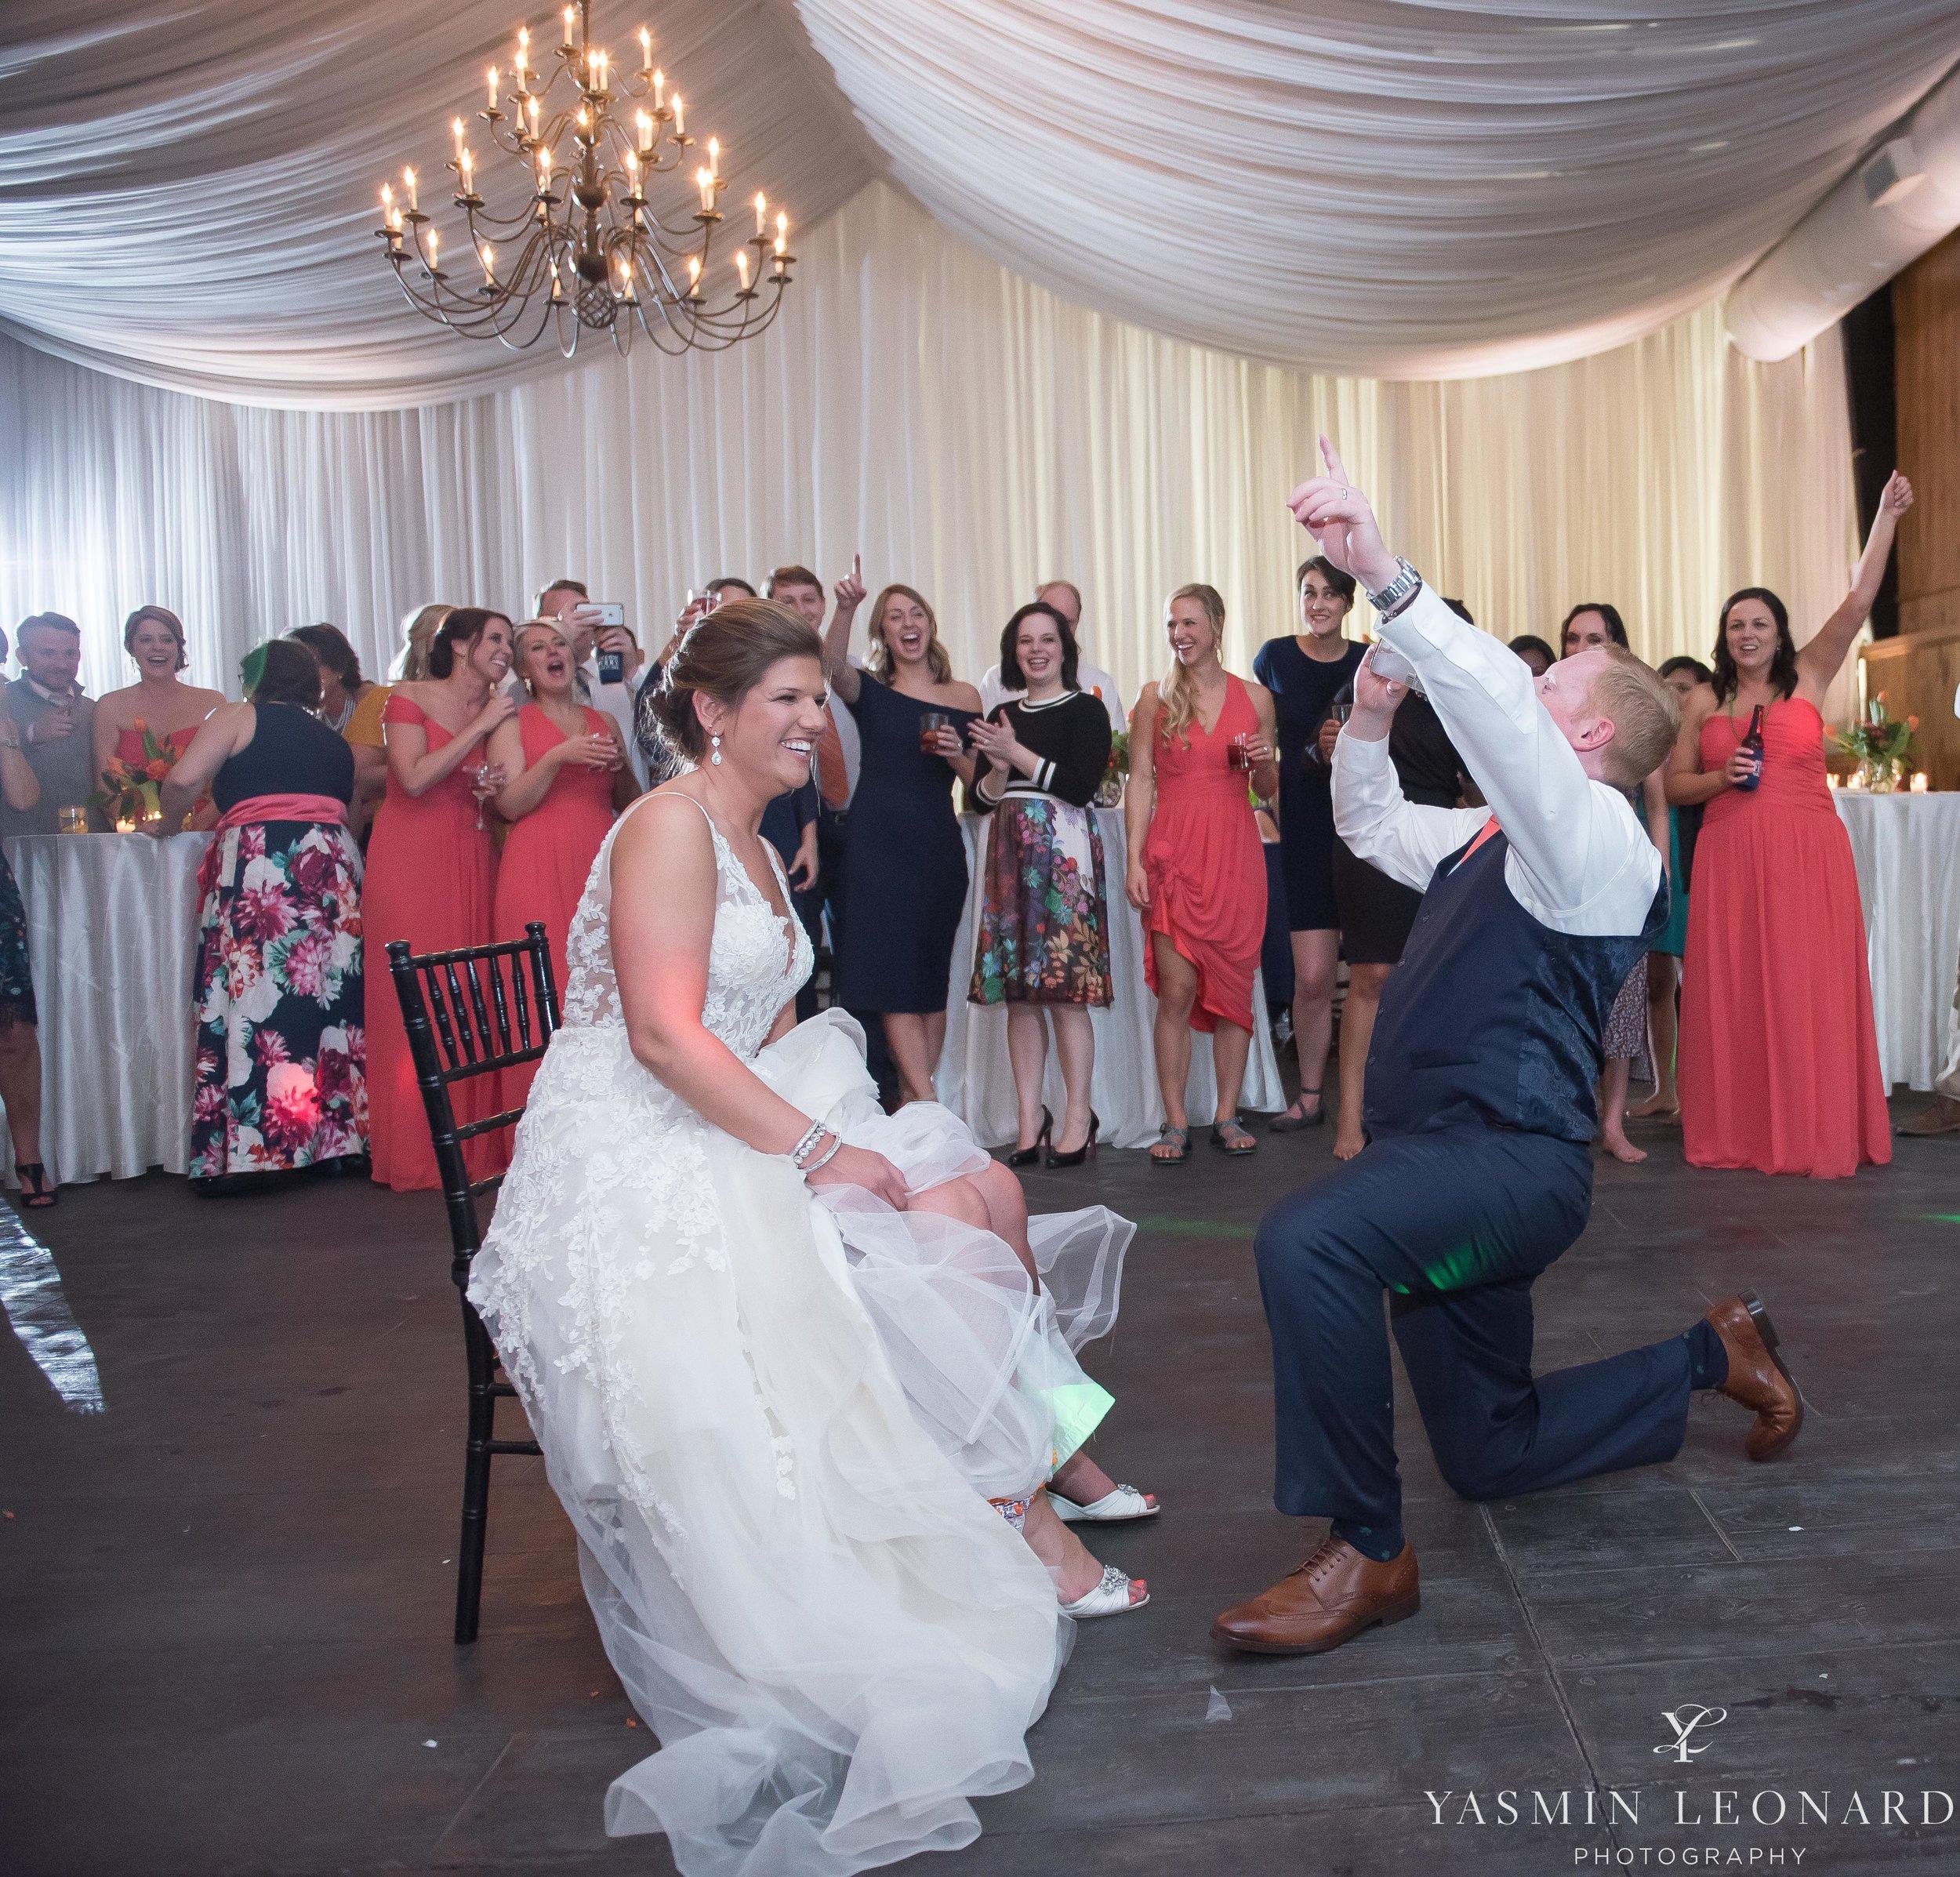 Adaumont Farm - Adaumont Farm Weddings - Trinity Weddings - NC Weddings - Yasmin Leonard Photography-96.jpg